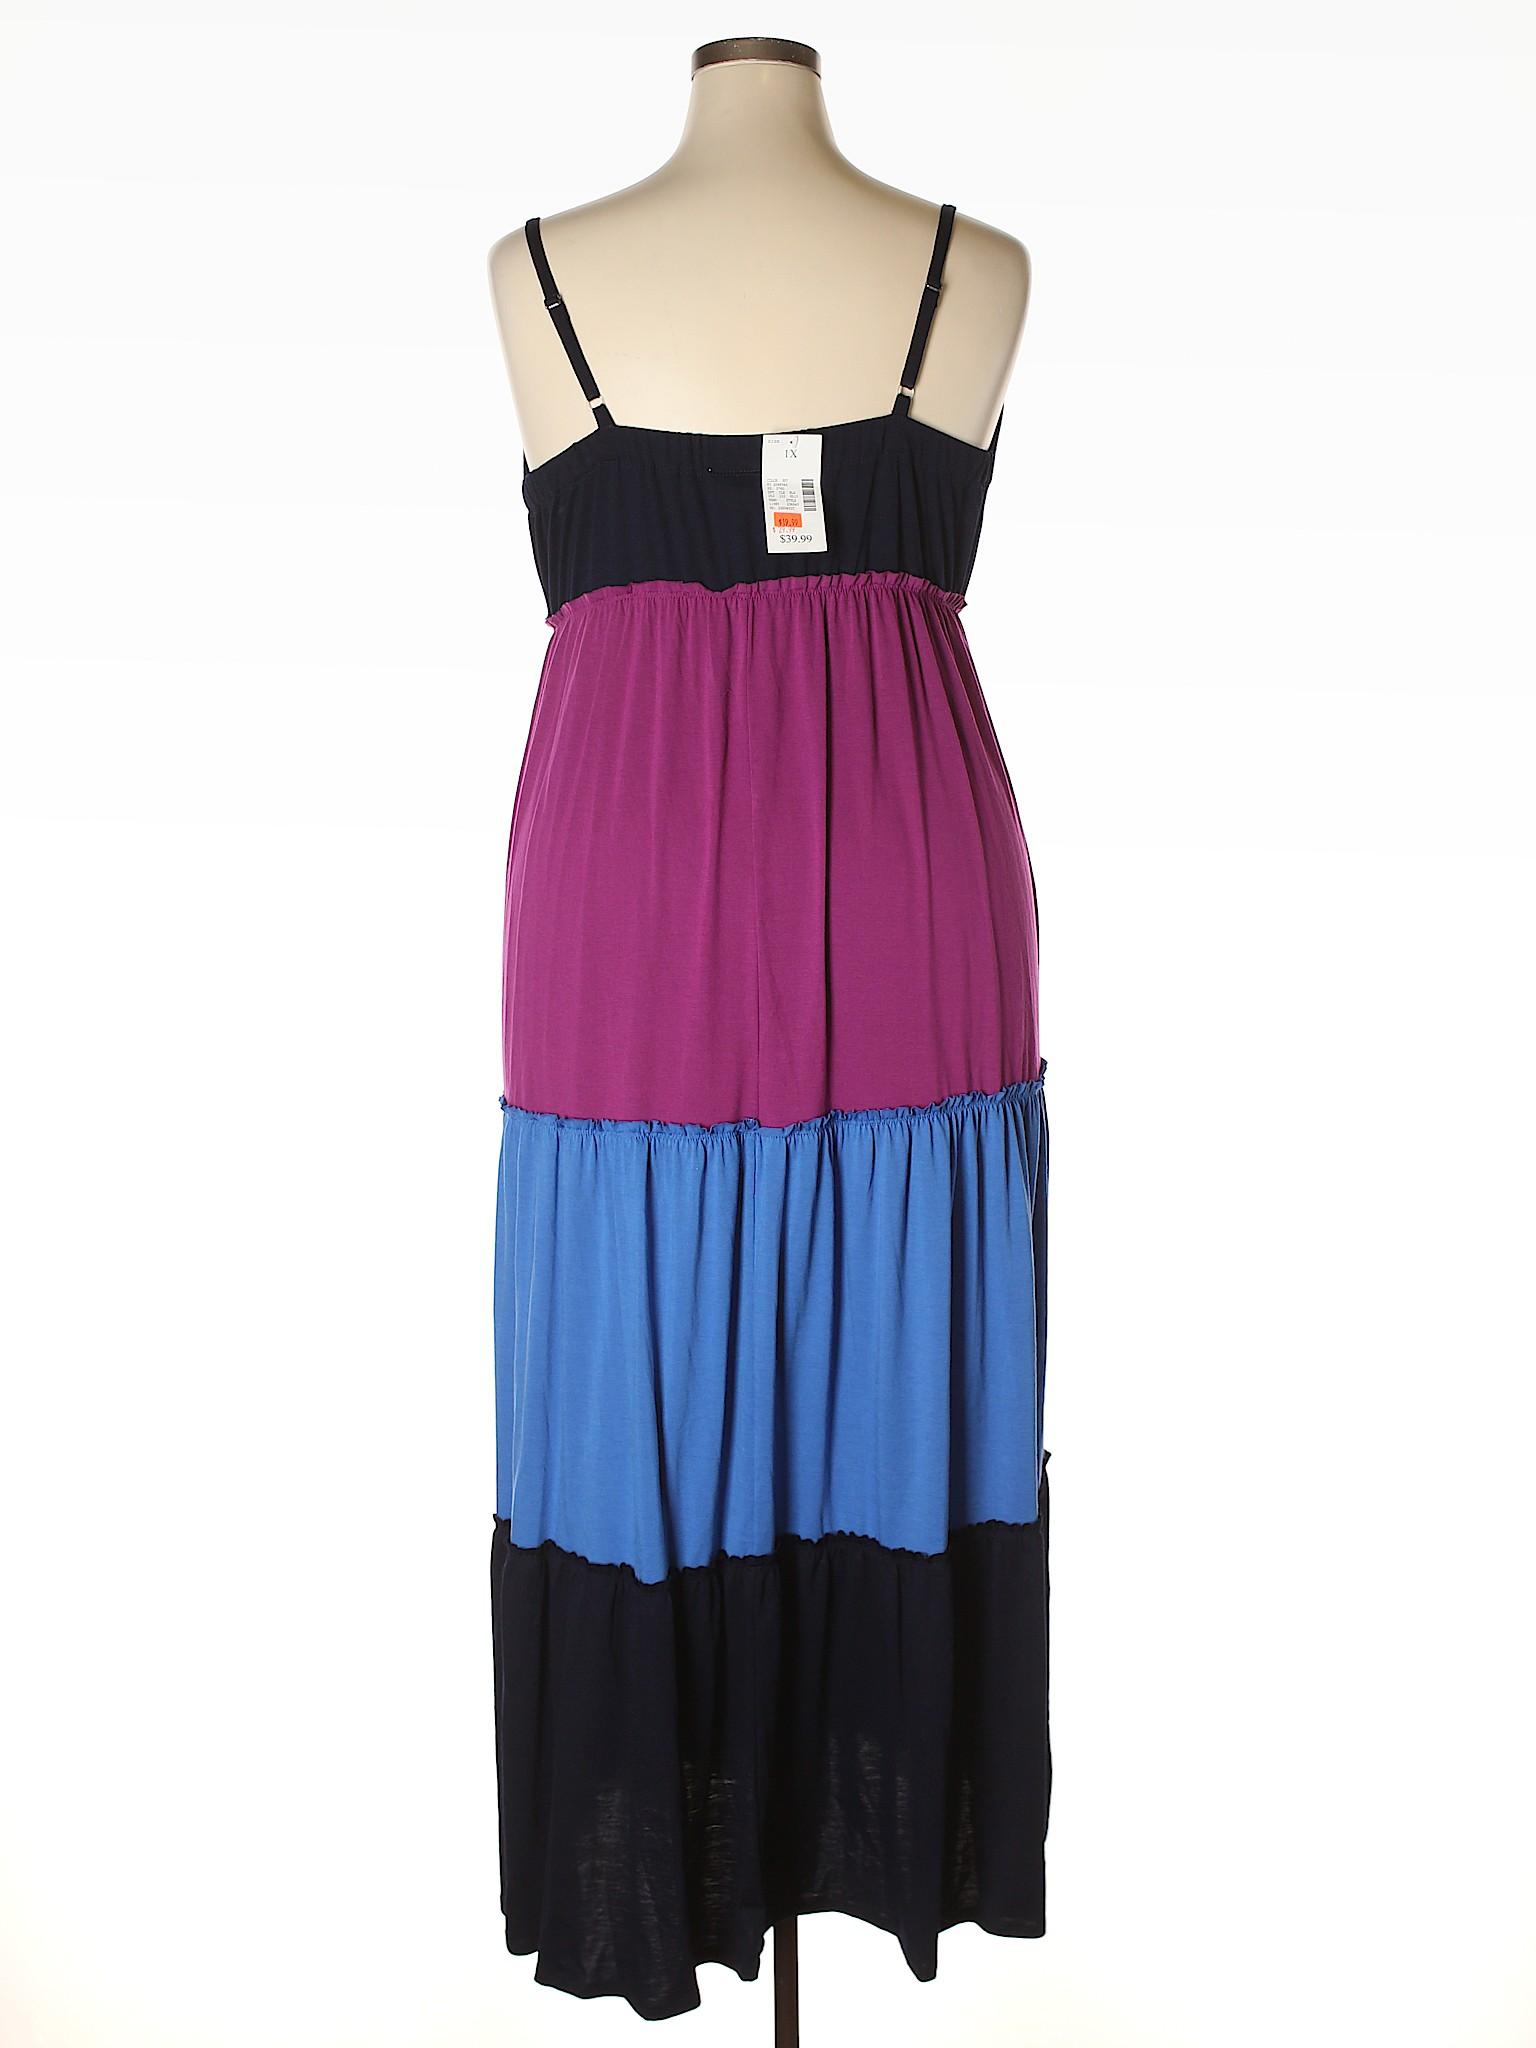 Bug Selling Selling Casual Dress Fashion Dress Fashion Casual Bug Dress Bug Fashion Casual Selling PqZR5BUwn